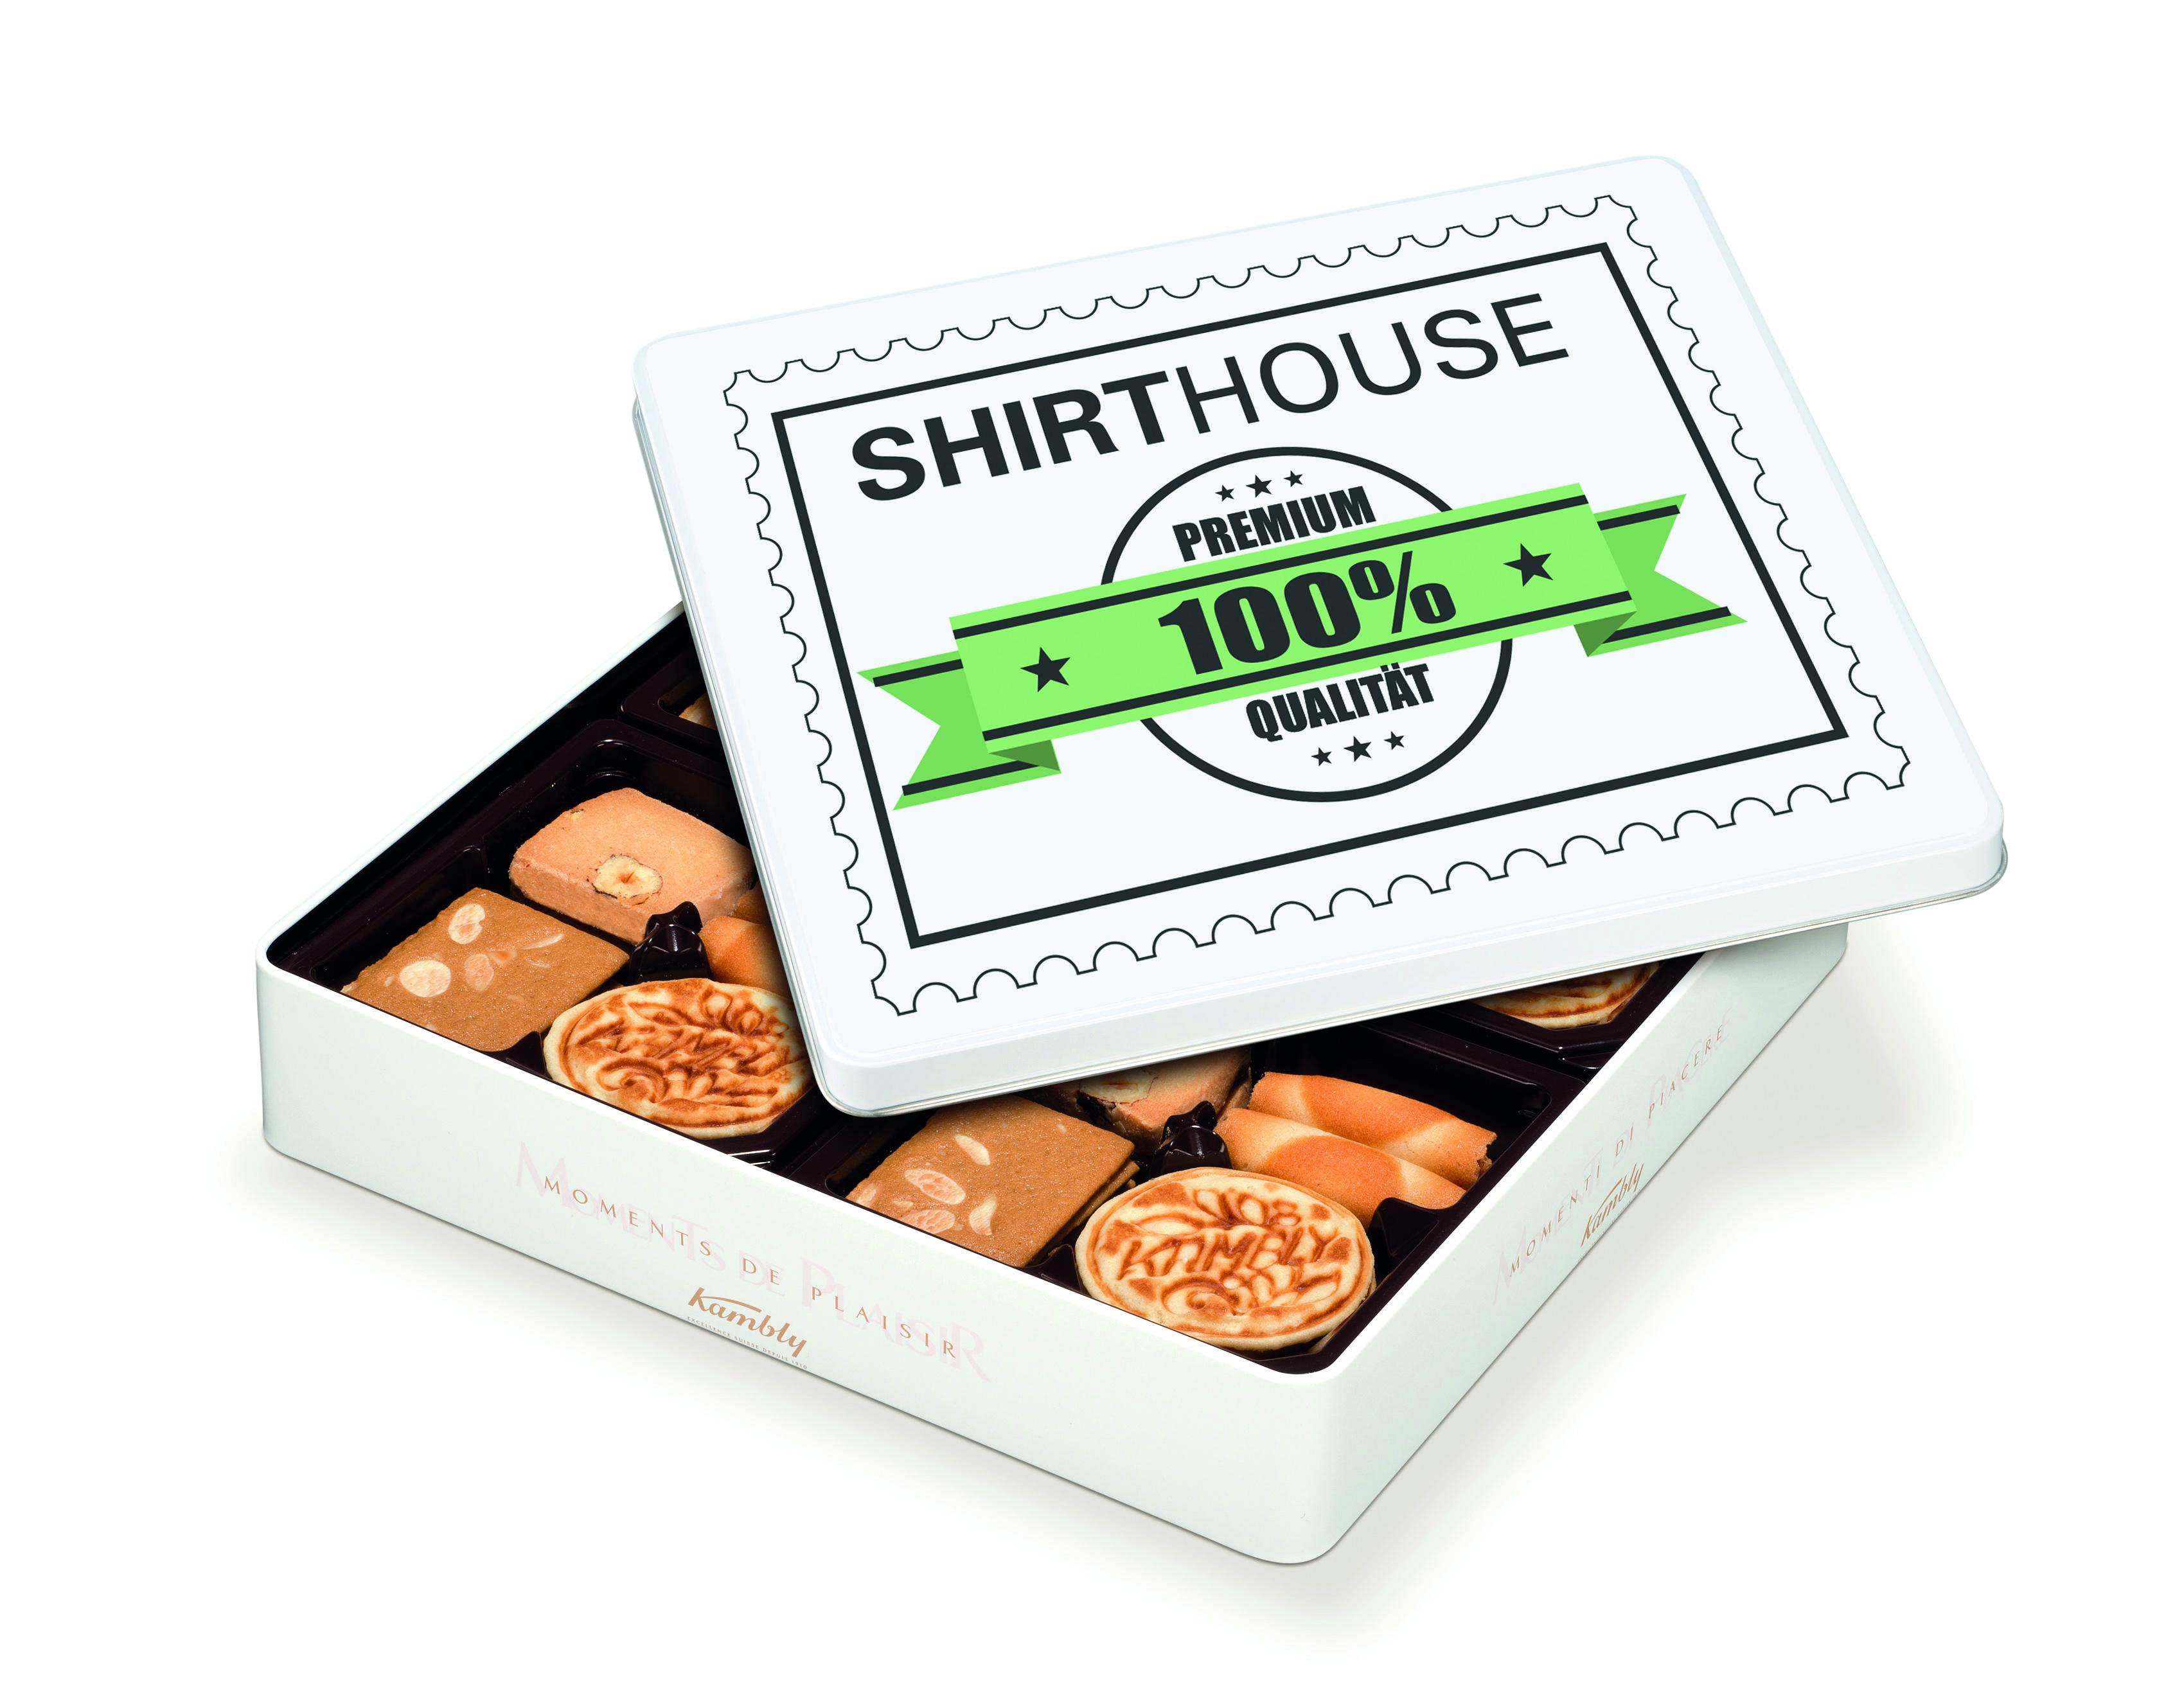 320g bedruckt_shirthouse quality